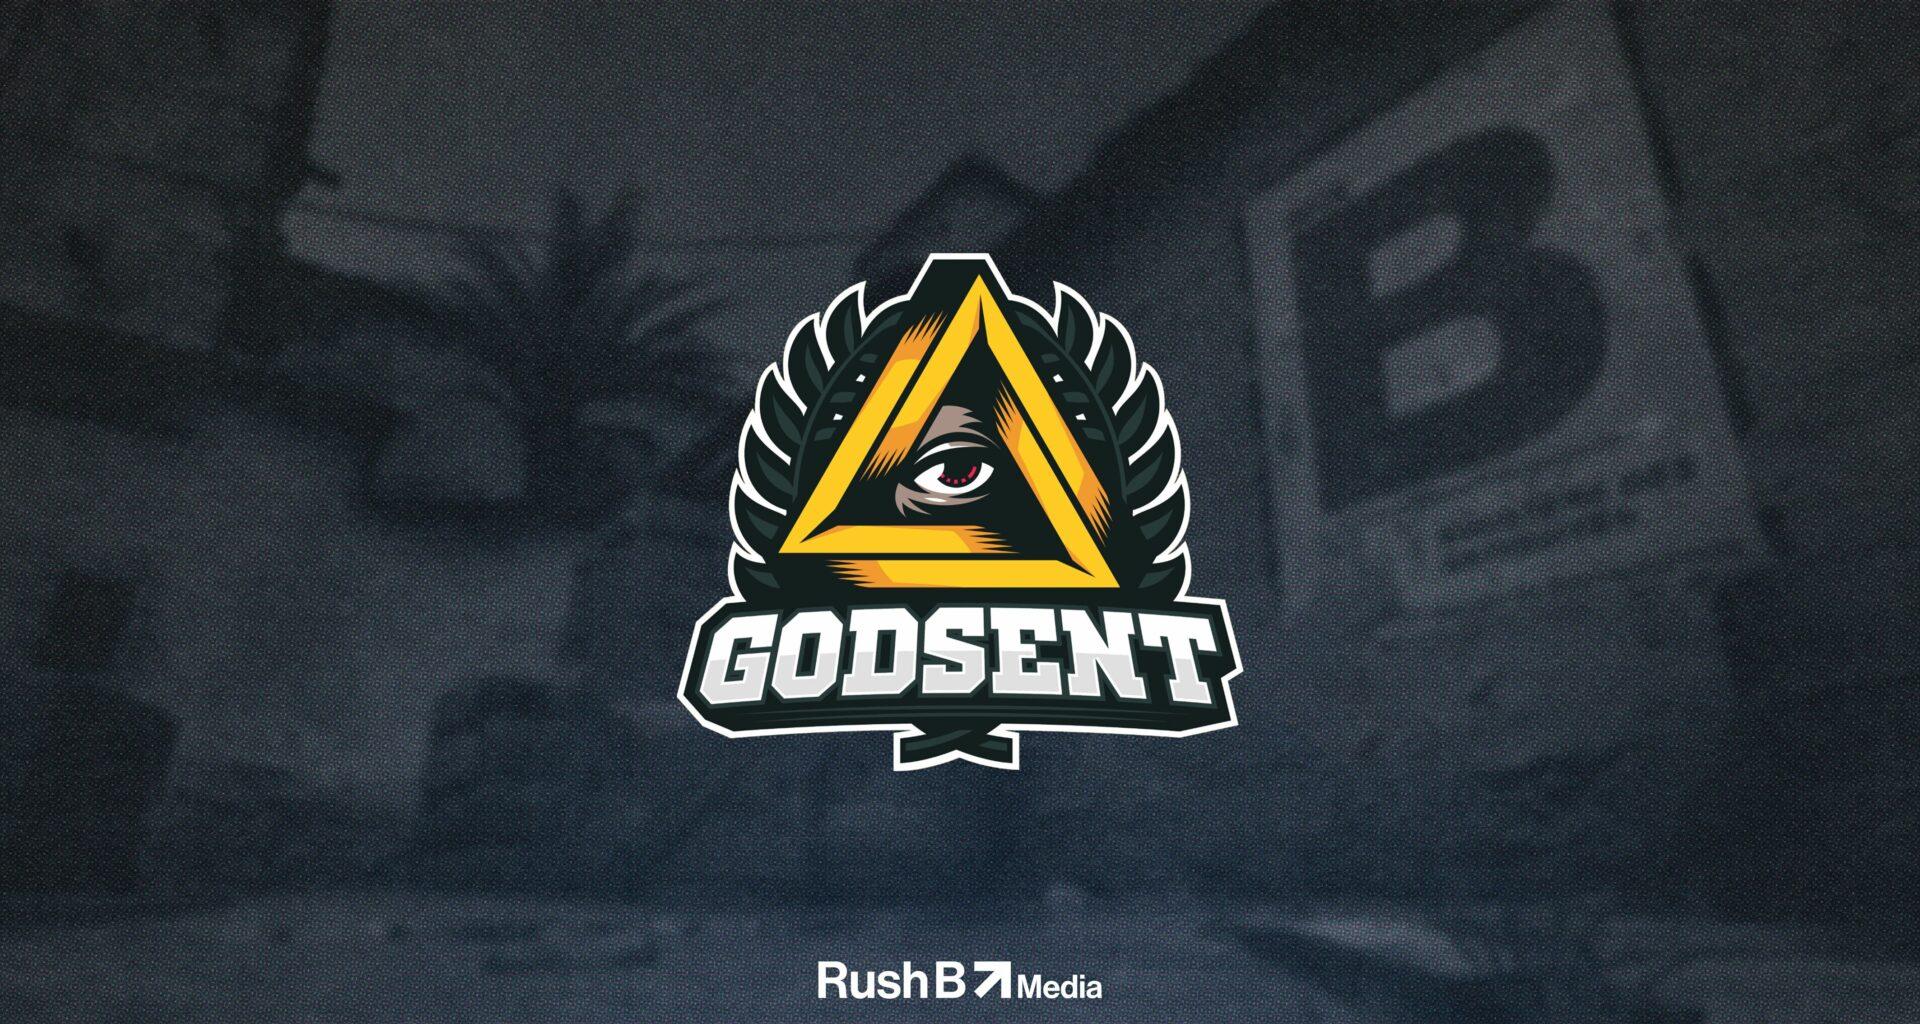 GODSENT header image